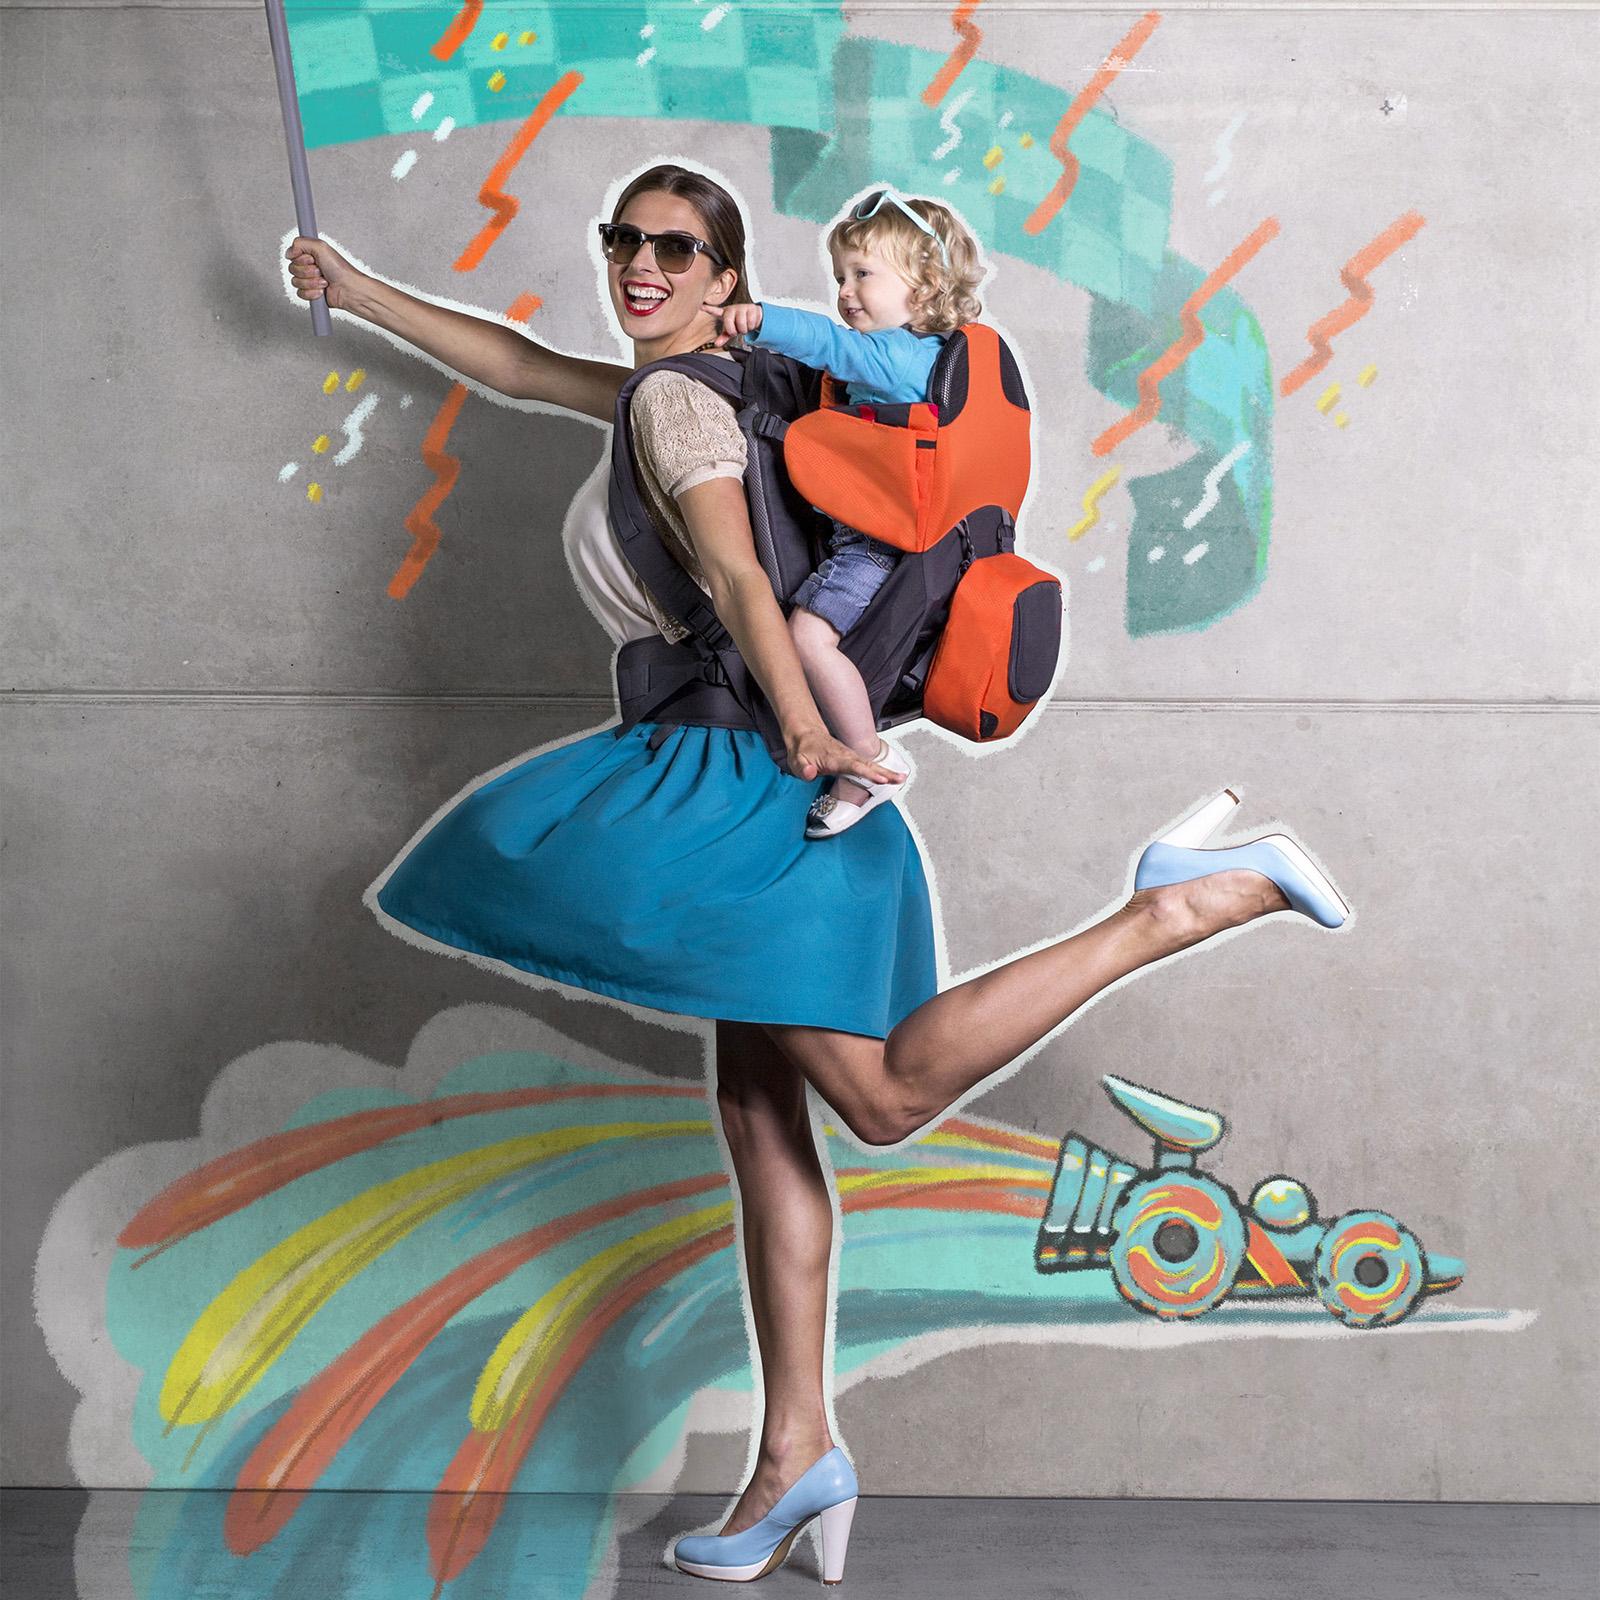 8c6a94deba6 ... Parade Baby Carrier - Orange   Grey · Phil   Teds · Watch Video